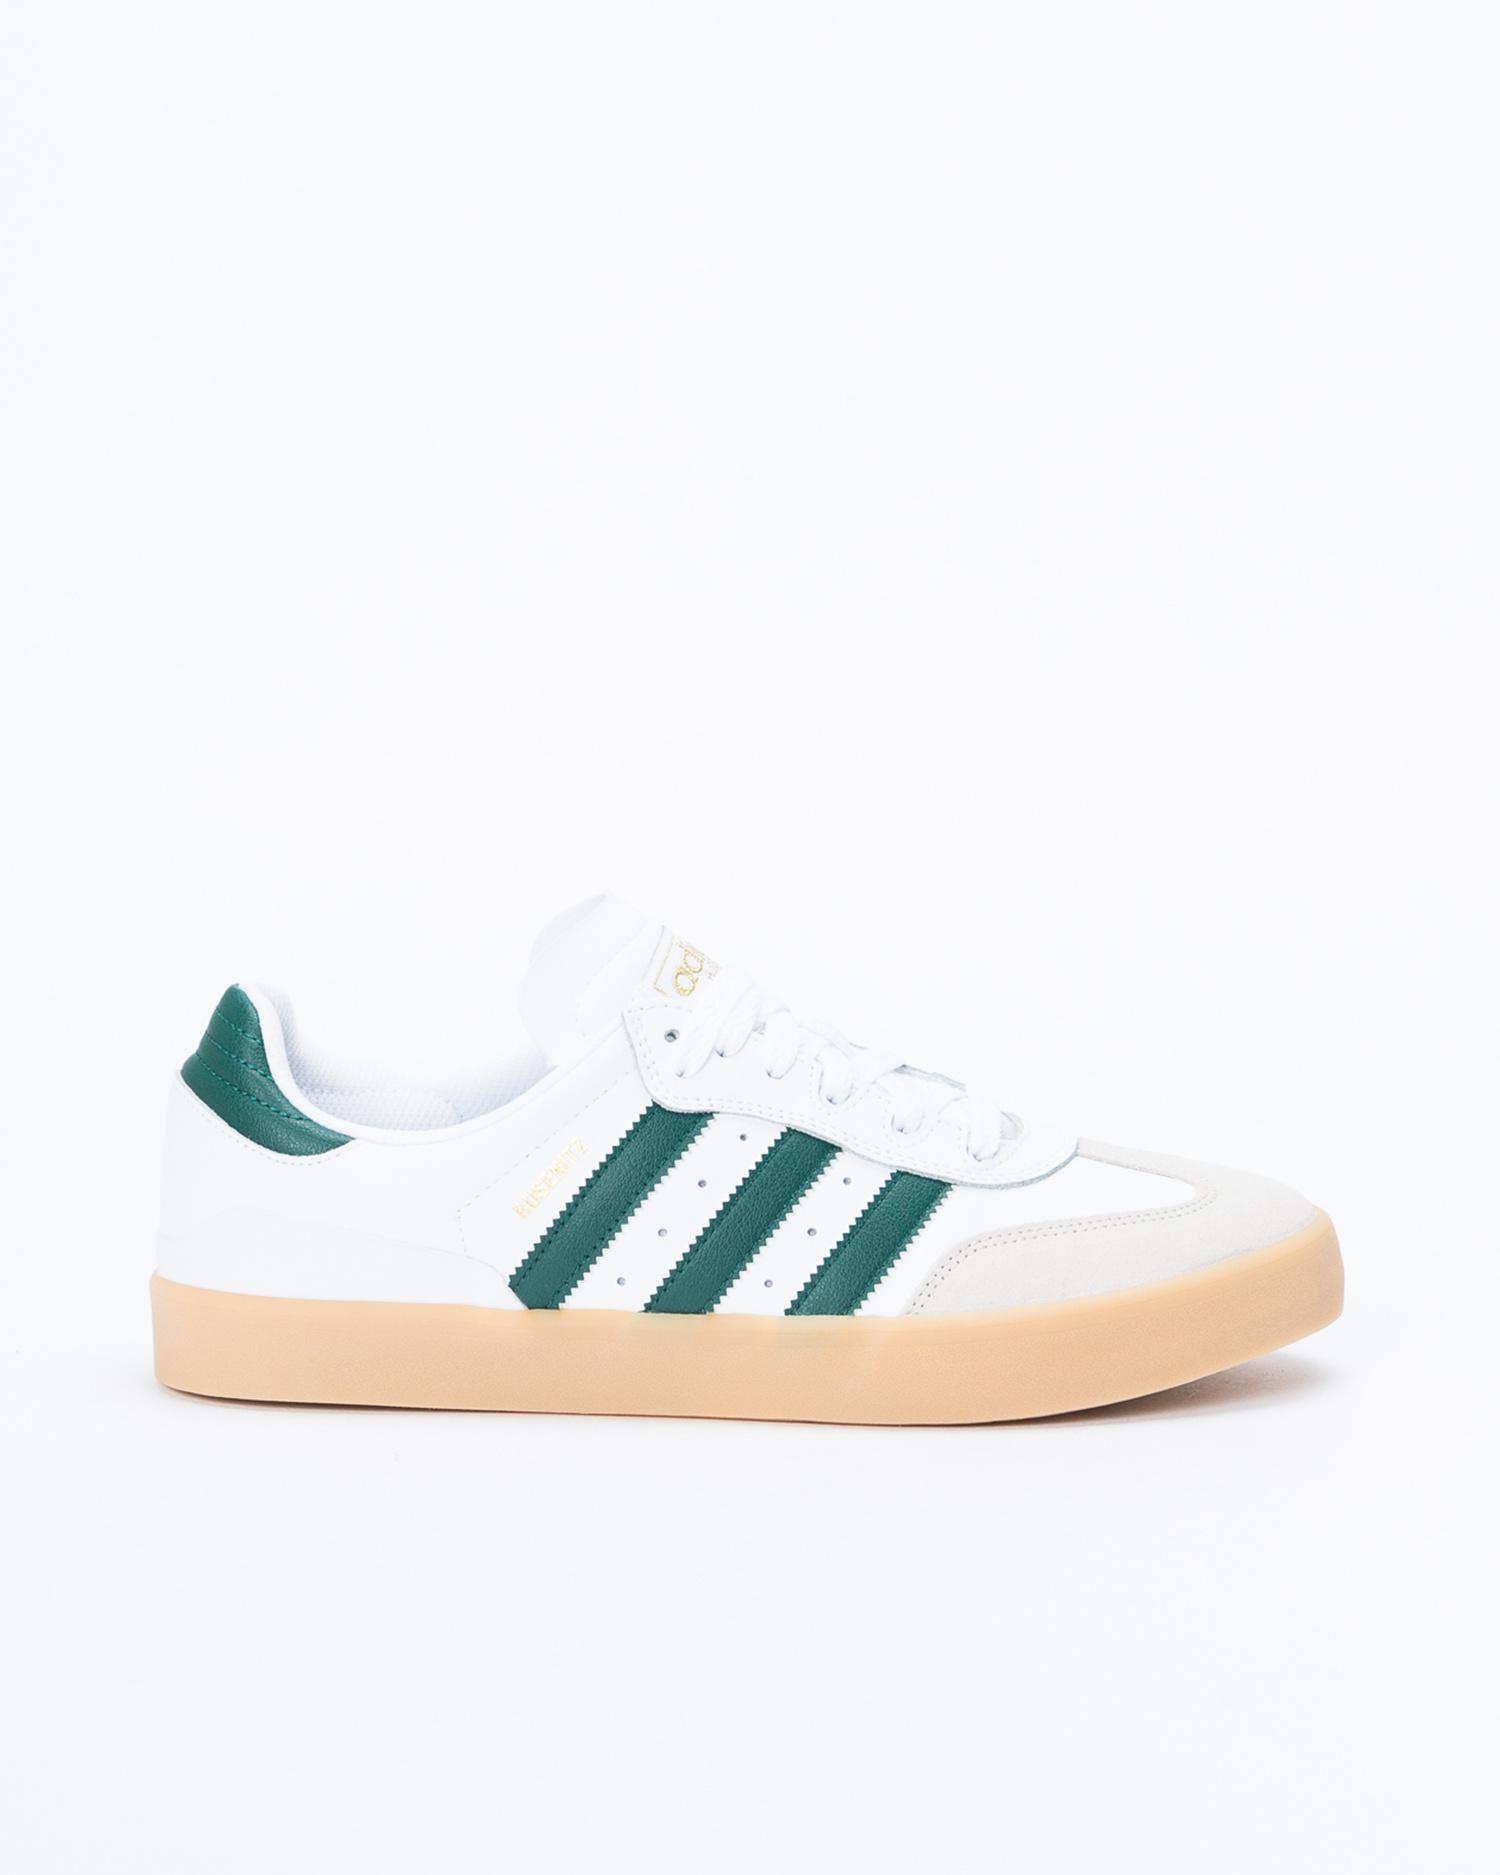 Adidas busenitz vulc rx ftwwht/cgreen/gum3